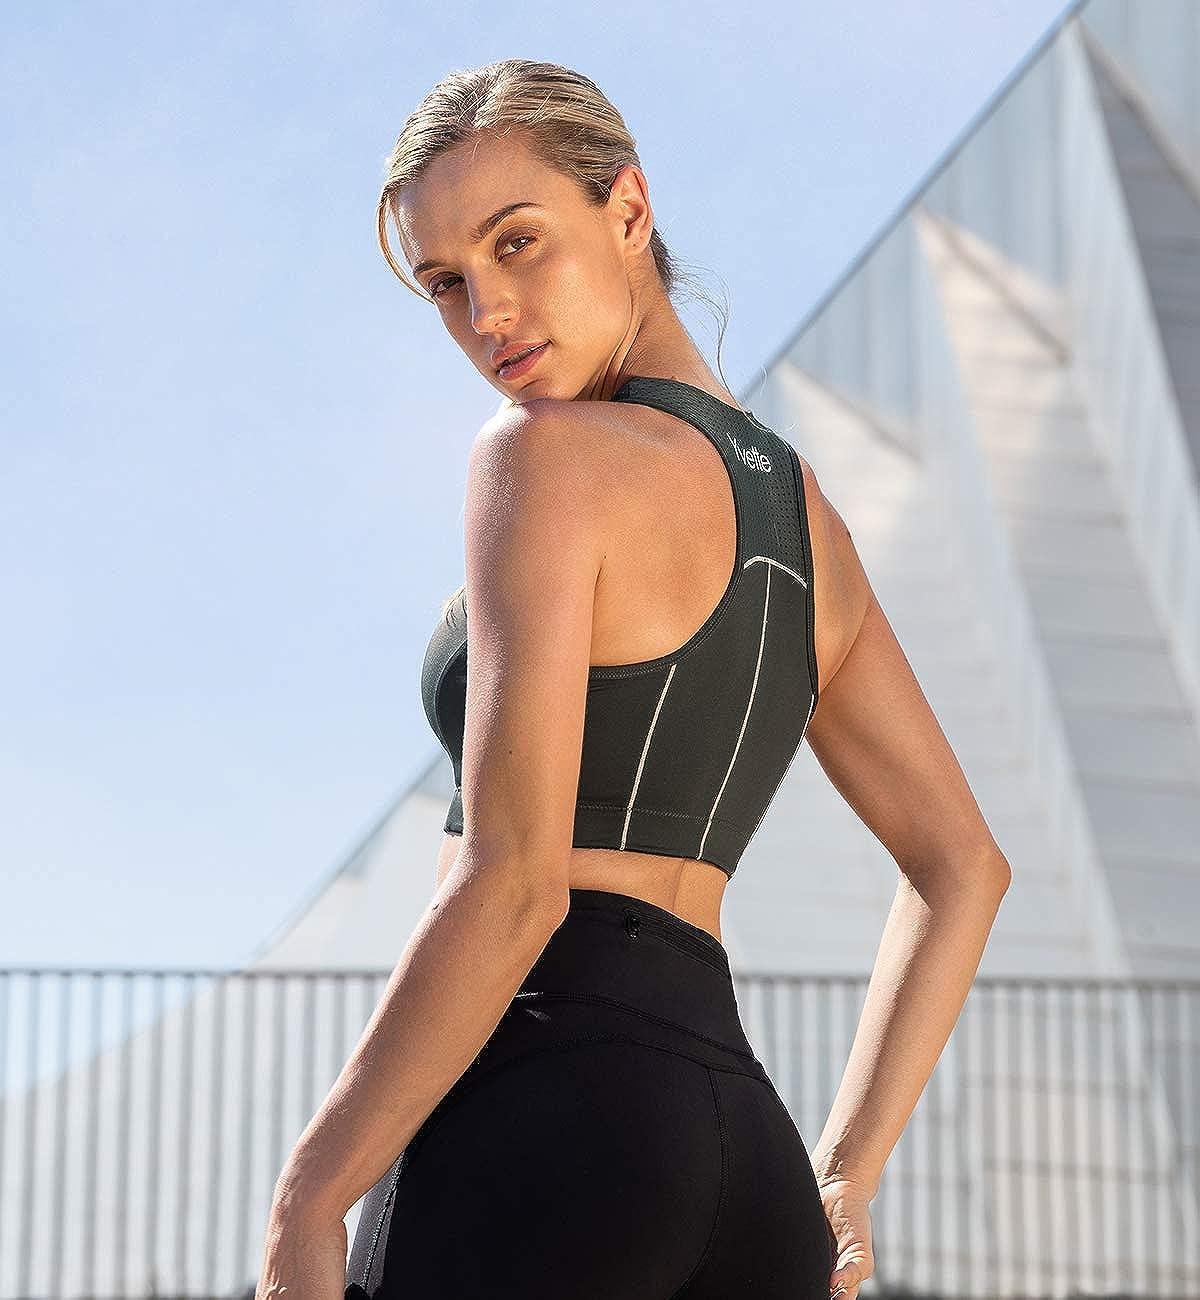 Yvette Womens Zip Front High Impact Sports Bra Breathable Racerback